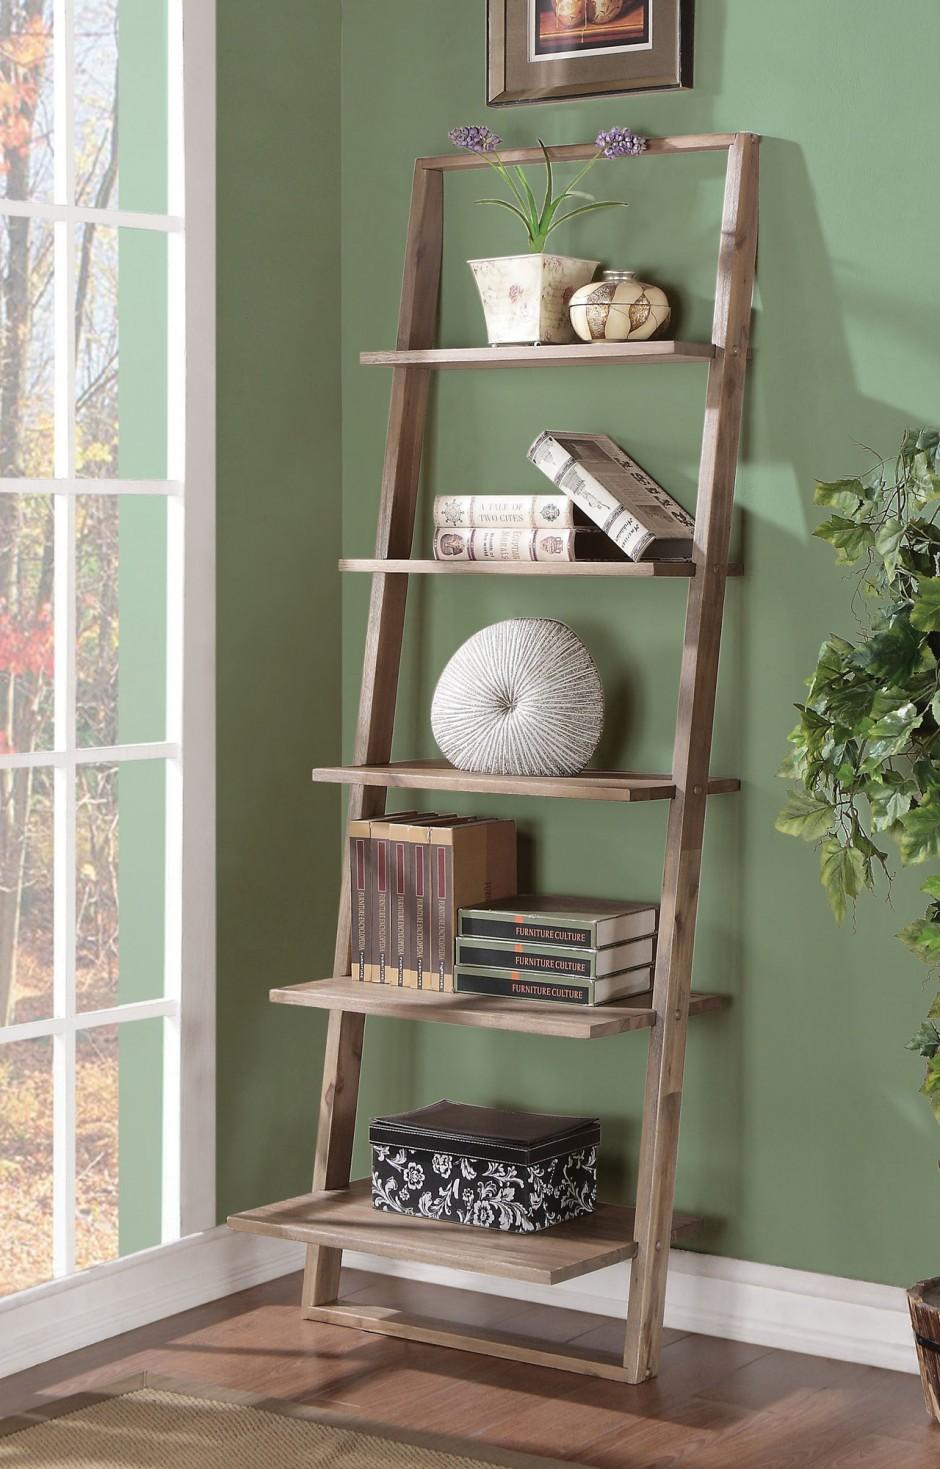 Kmart Bookshelves | Kmart Booster Seat | Kmart Couches